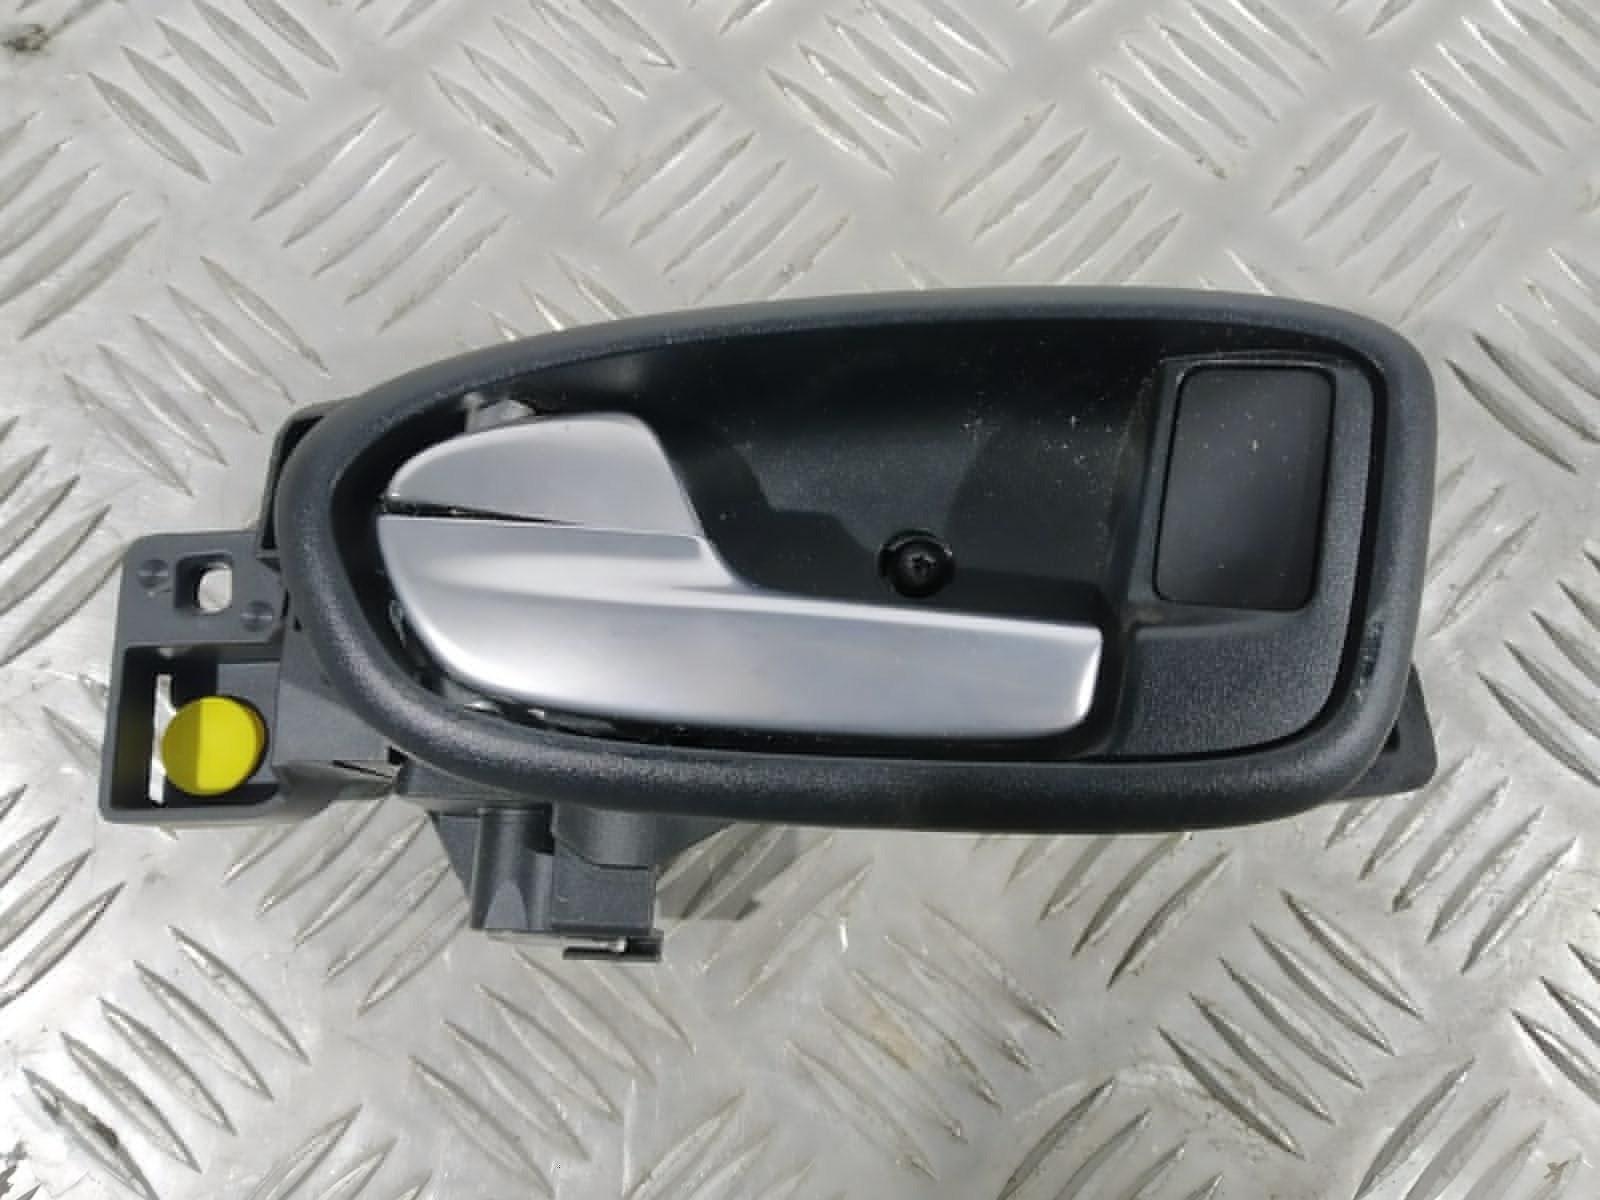 Ручка внутренняя задняя левая Ford Mondeo 1.8 2009 (б/у)